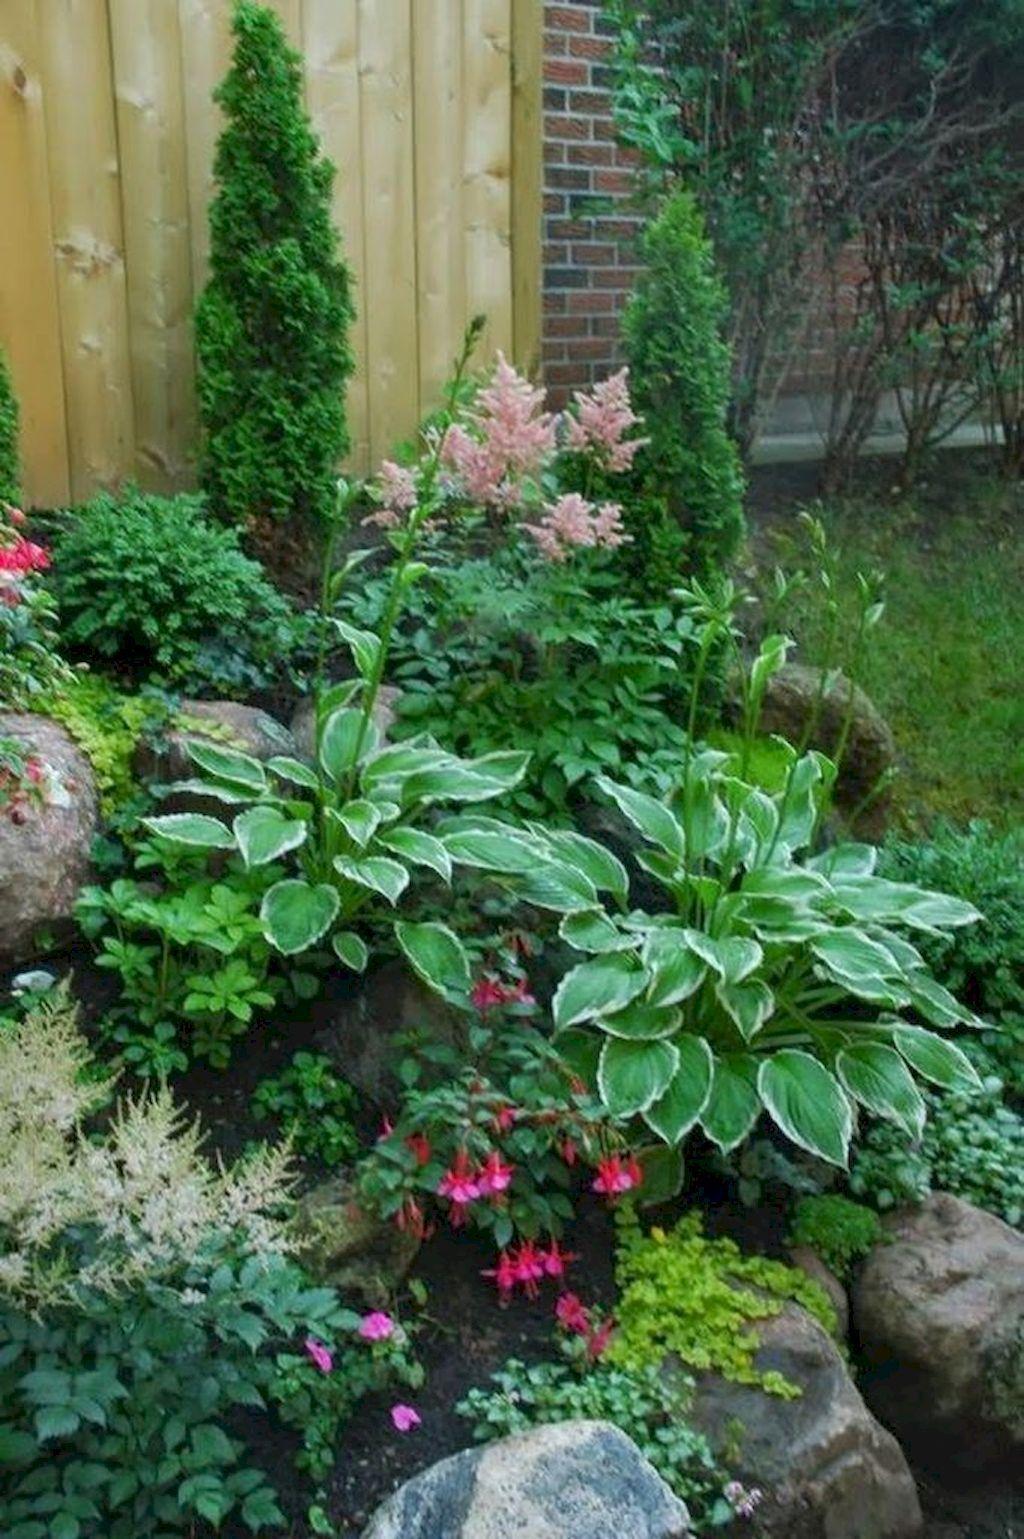 45 Affordable Diy Design Ideas For A Vegetable Garden In 2020 Shade Garden Design Shade Garden Small Front Yard Landscaping